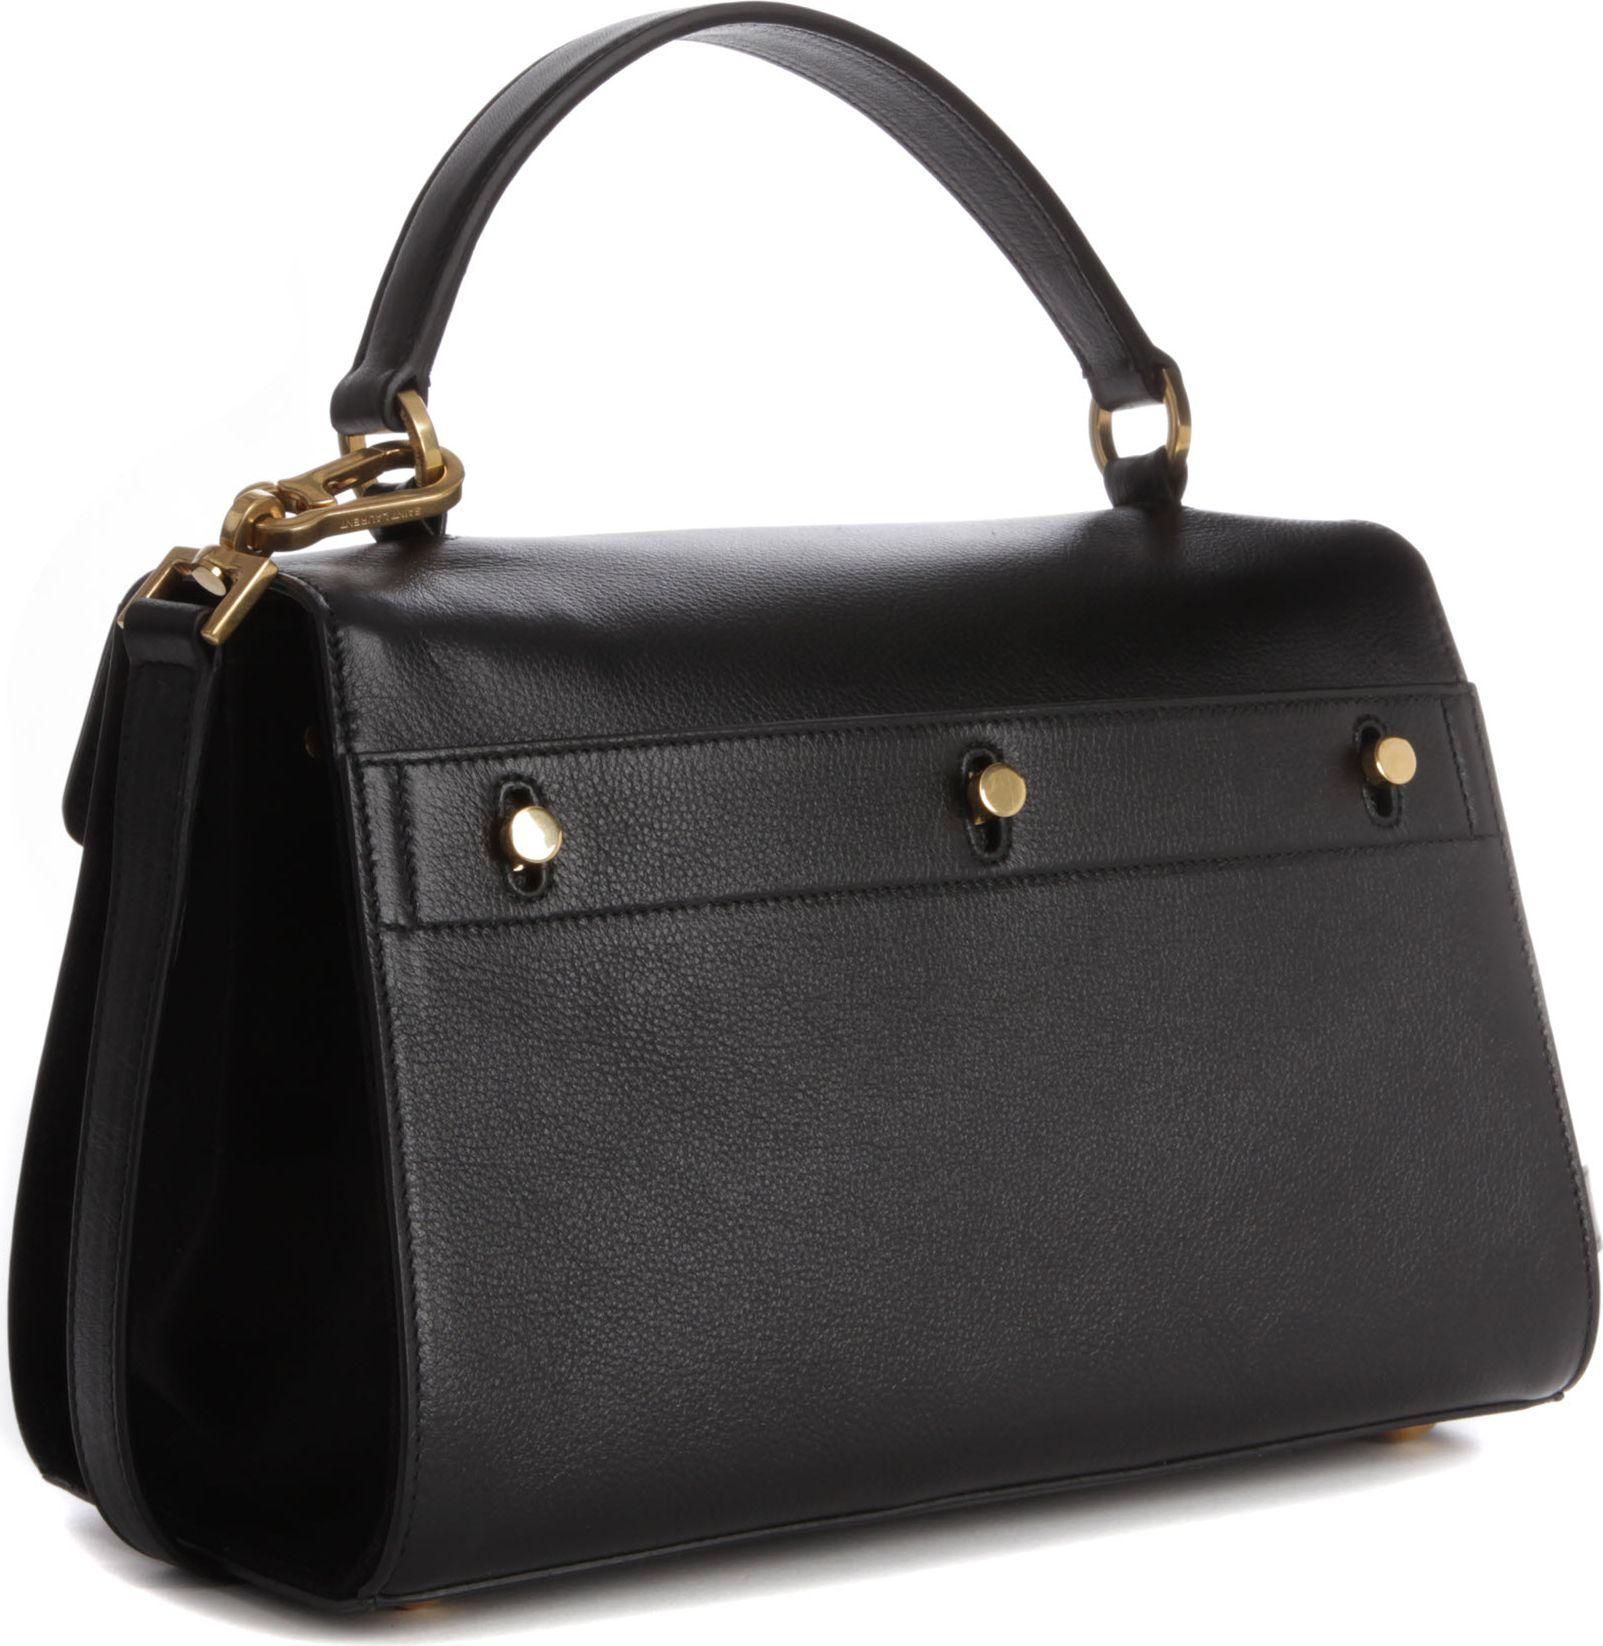 80c609ad ysl muse two rabbit handbag